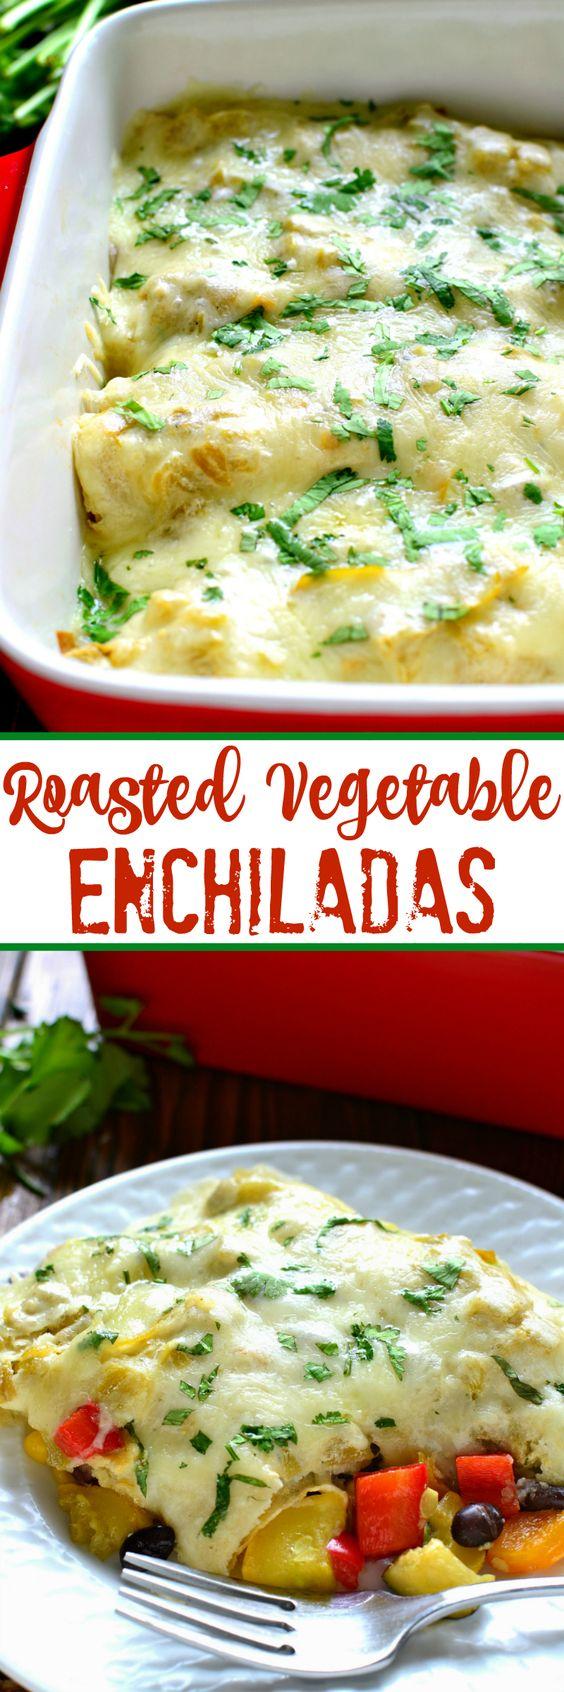 Roasted Vegetable Enchiladas | Recipe | Vegetable Enchiladas, Roasted ...